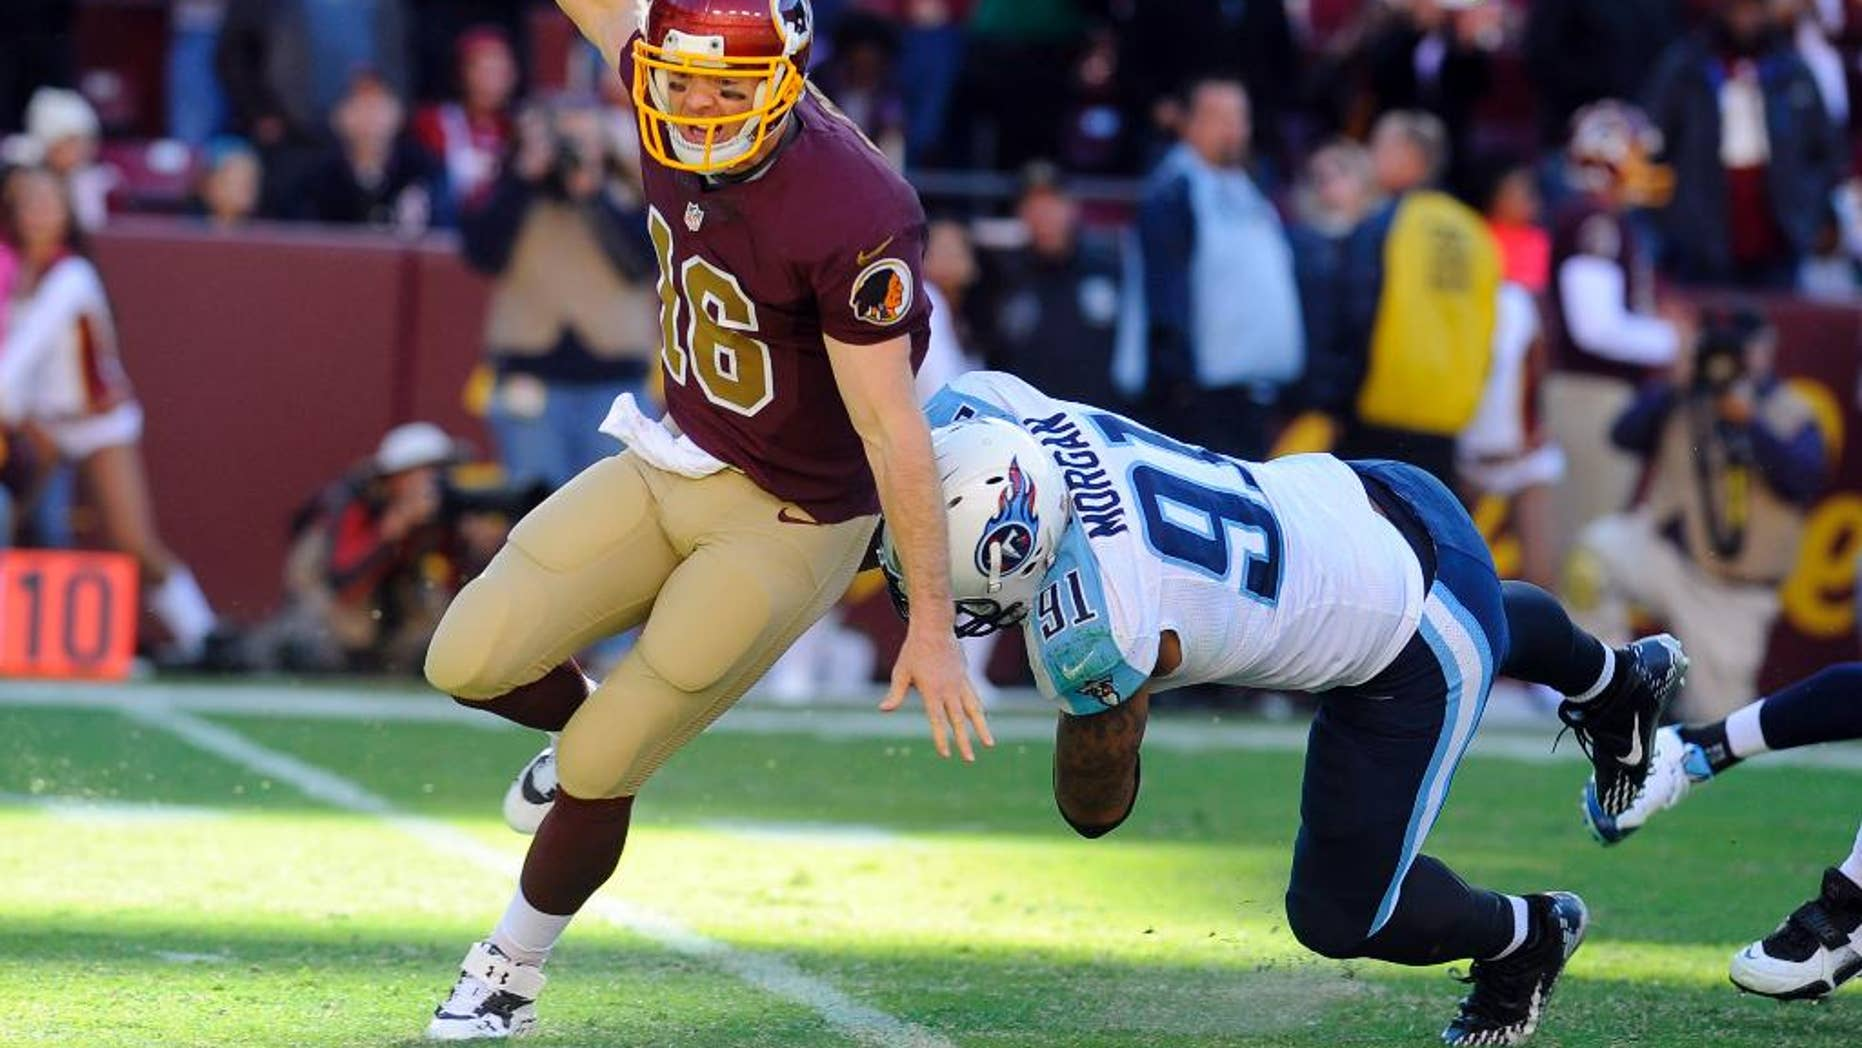 Washington Redskins quarterback Colt McCoy (16) avoids Tennessee Titans outside linebacker Derrick Morgan (91) during the second half of an NFL football game, Sunday, Oct. 19, 2014, in Landover, Md. The Redskins won 19-17. (AP Photo/Richard Lipski)